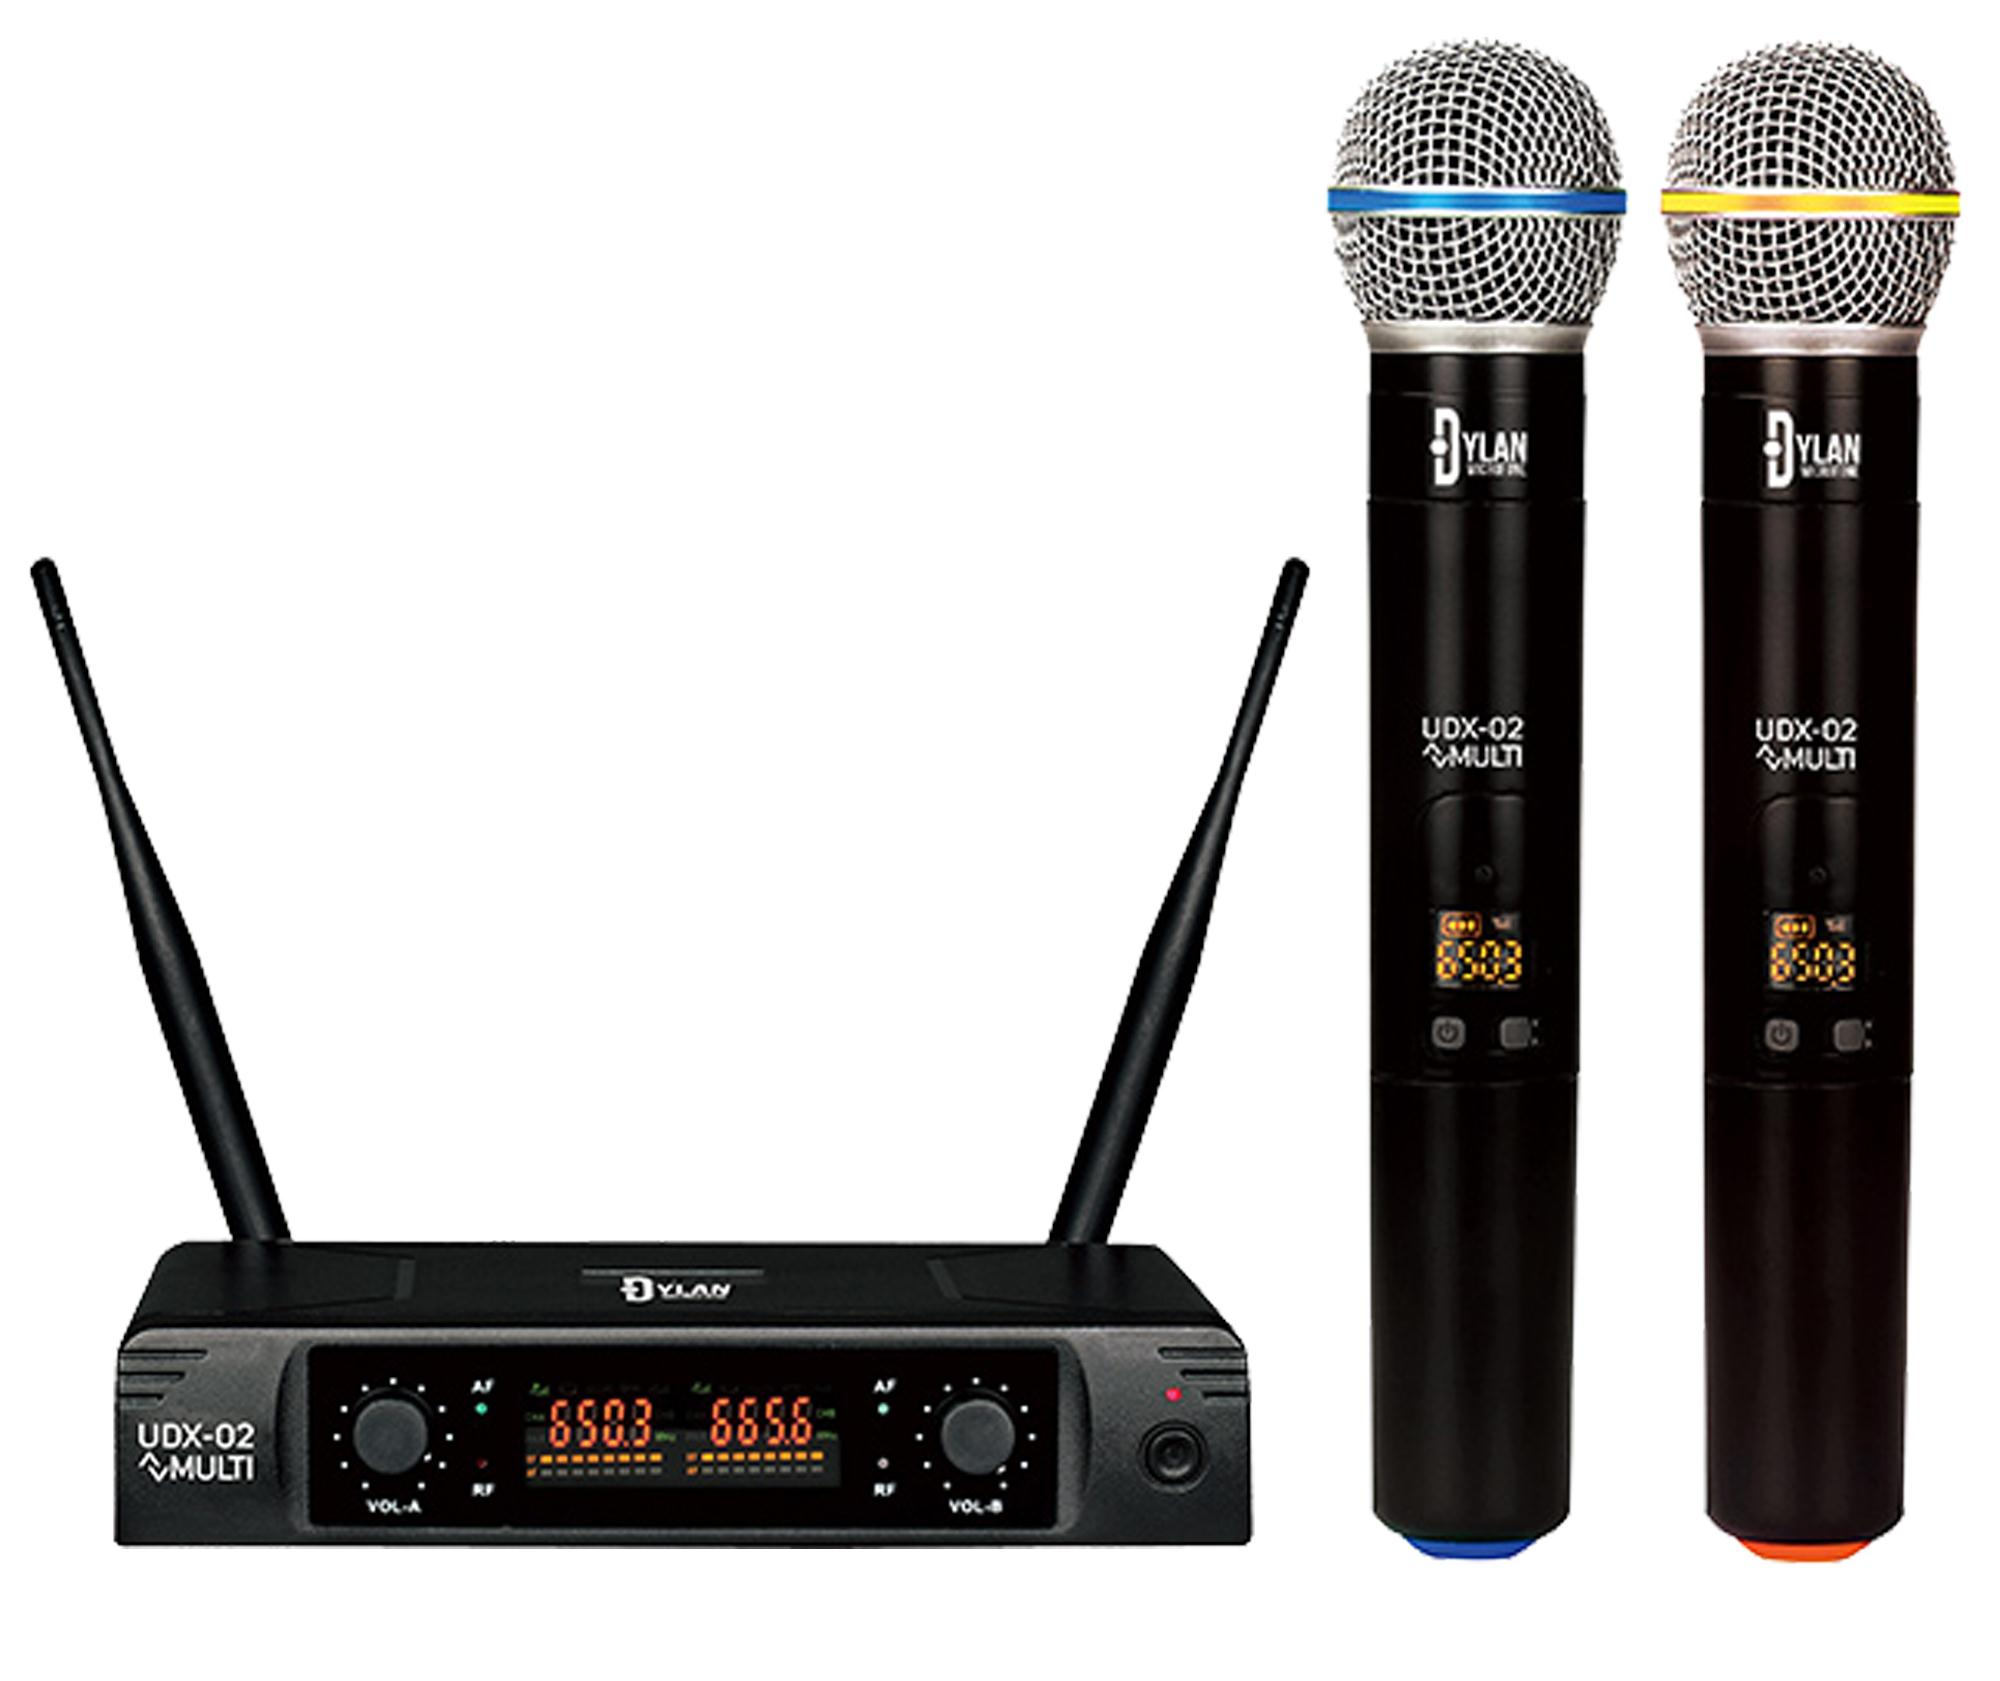 Microfone Sem Fio Duplo Dylan UDX-02 MULTI (UHF/Display Digital com 30 Canais)